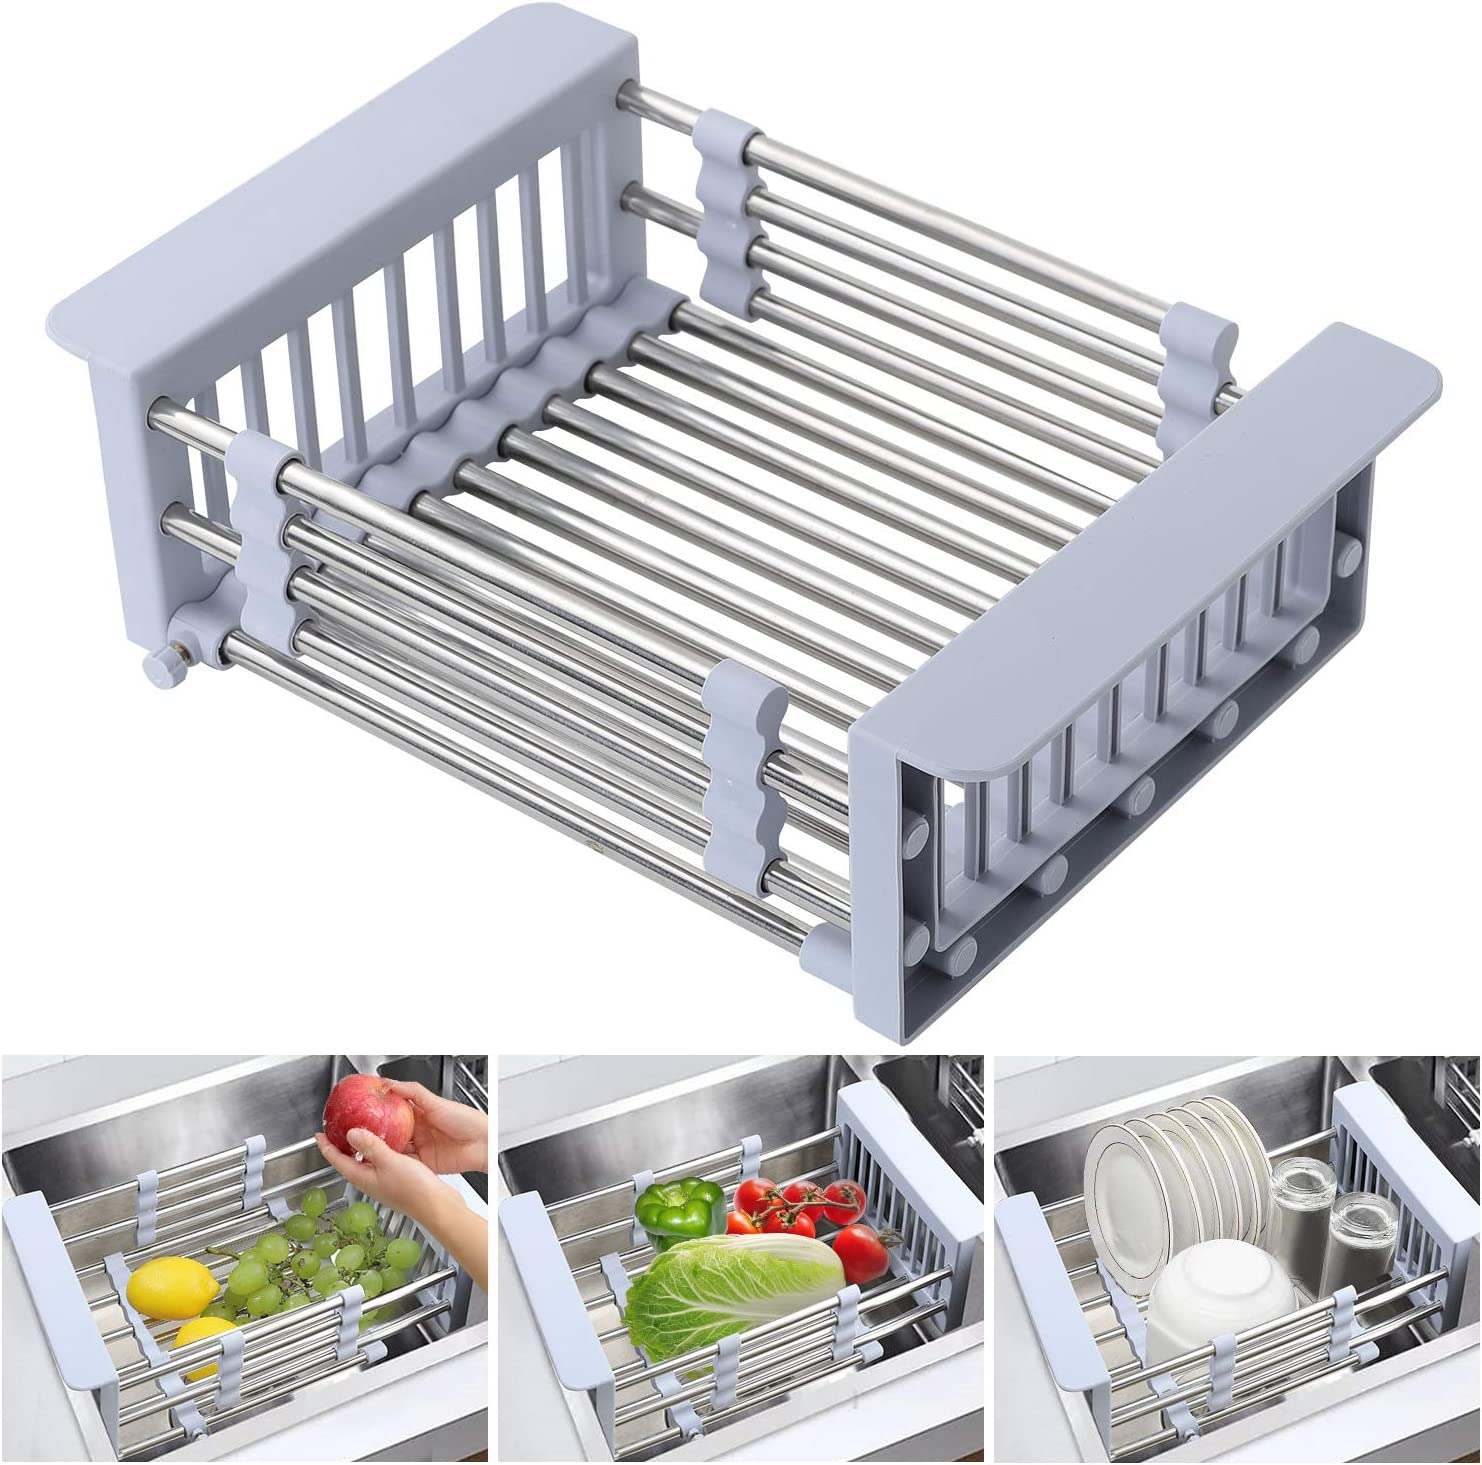 Stainless Steel Dish Drying Rack Over Sink Kitchen Organizer Fast Drain Basket